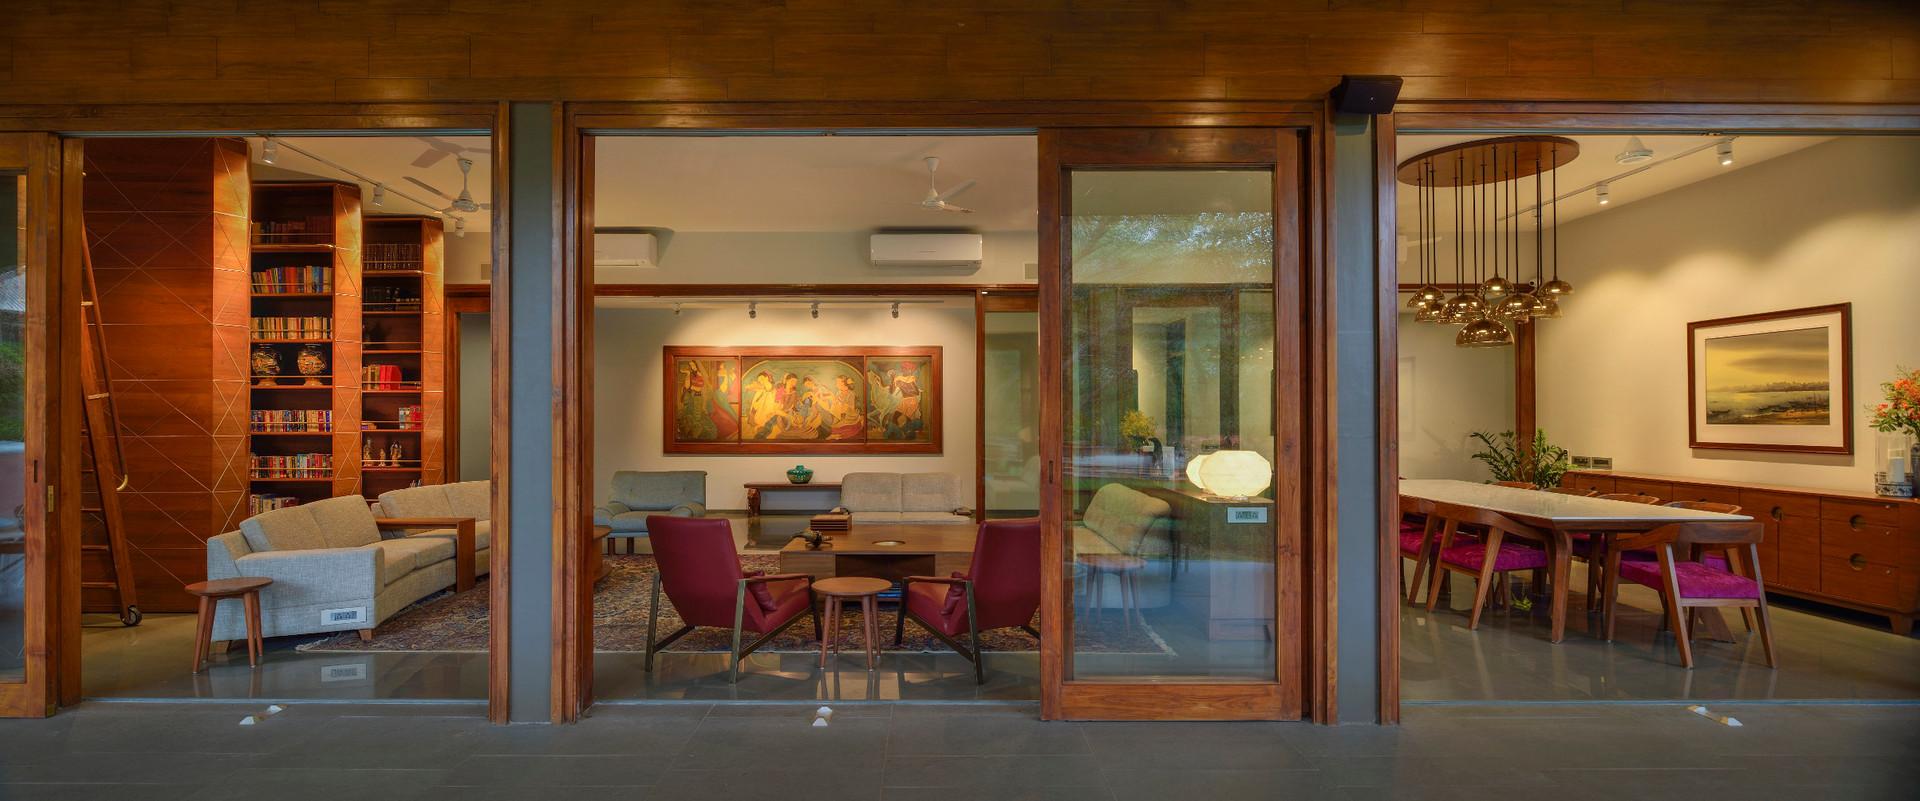 Living dining area from verandah.JPG